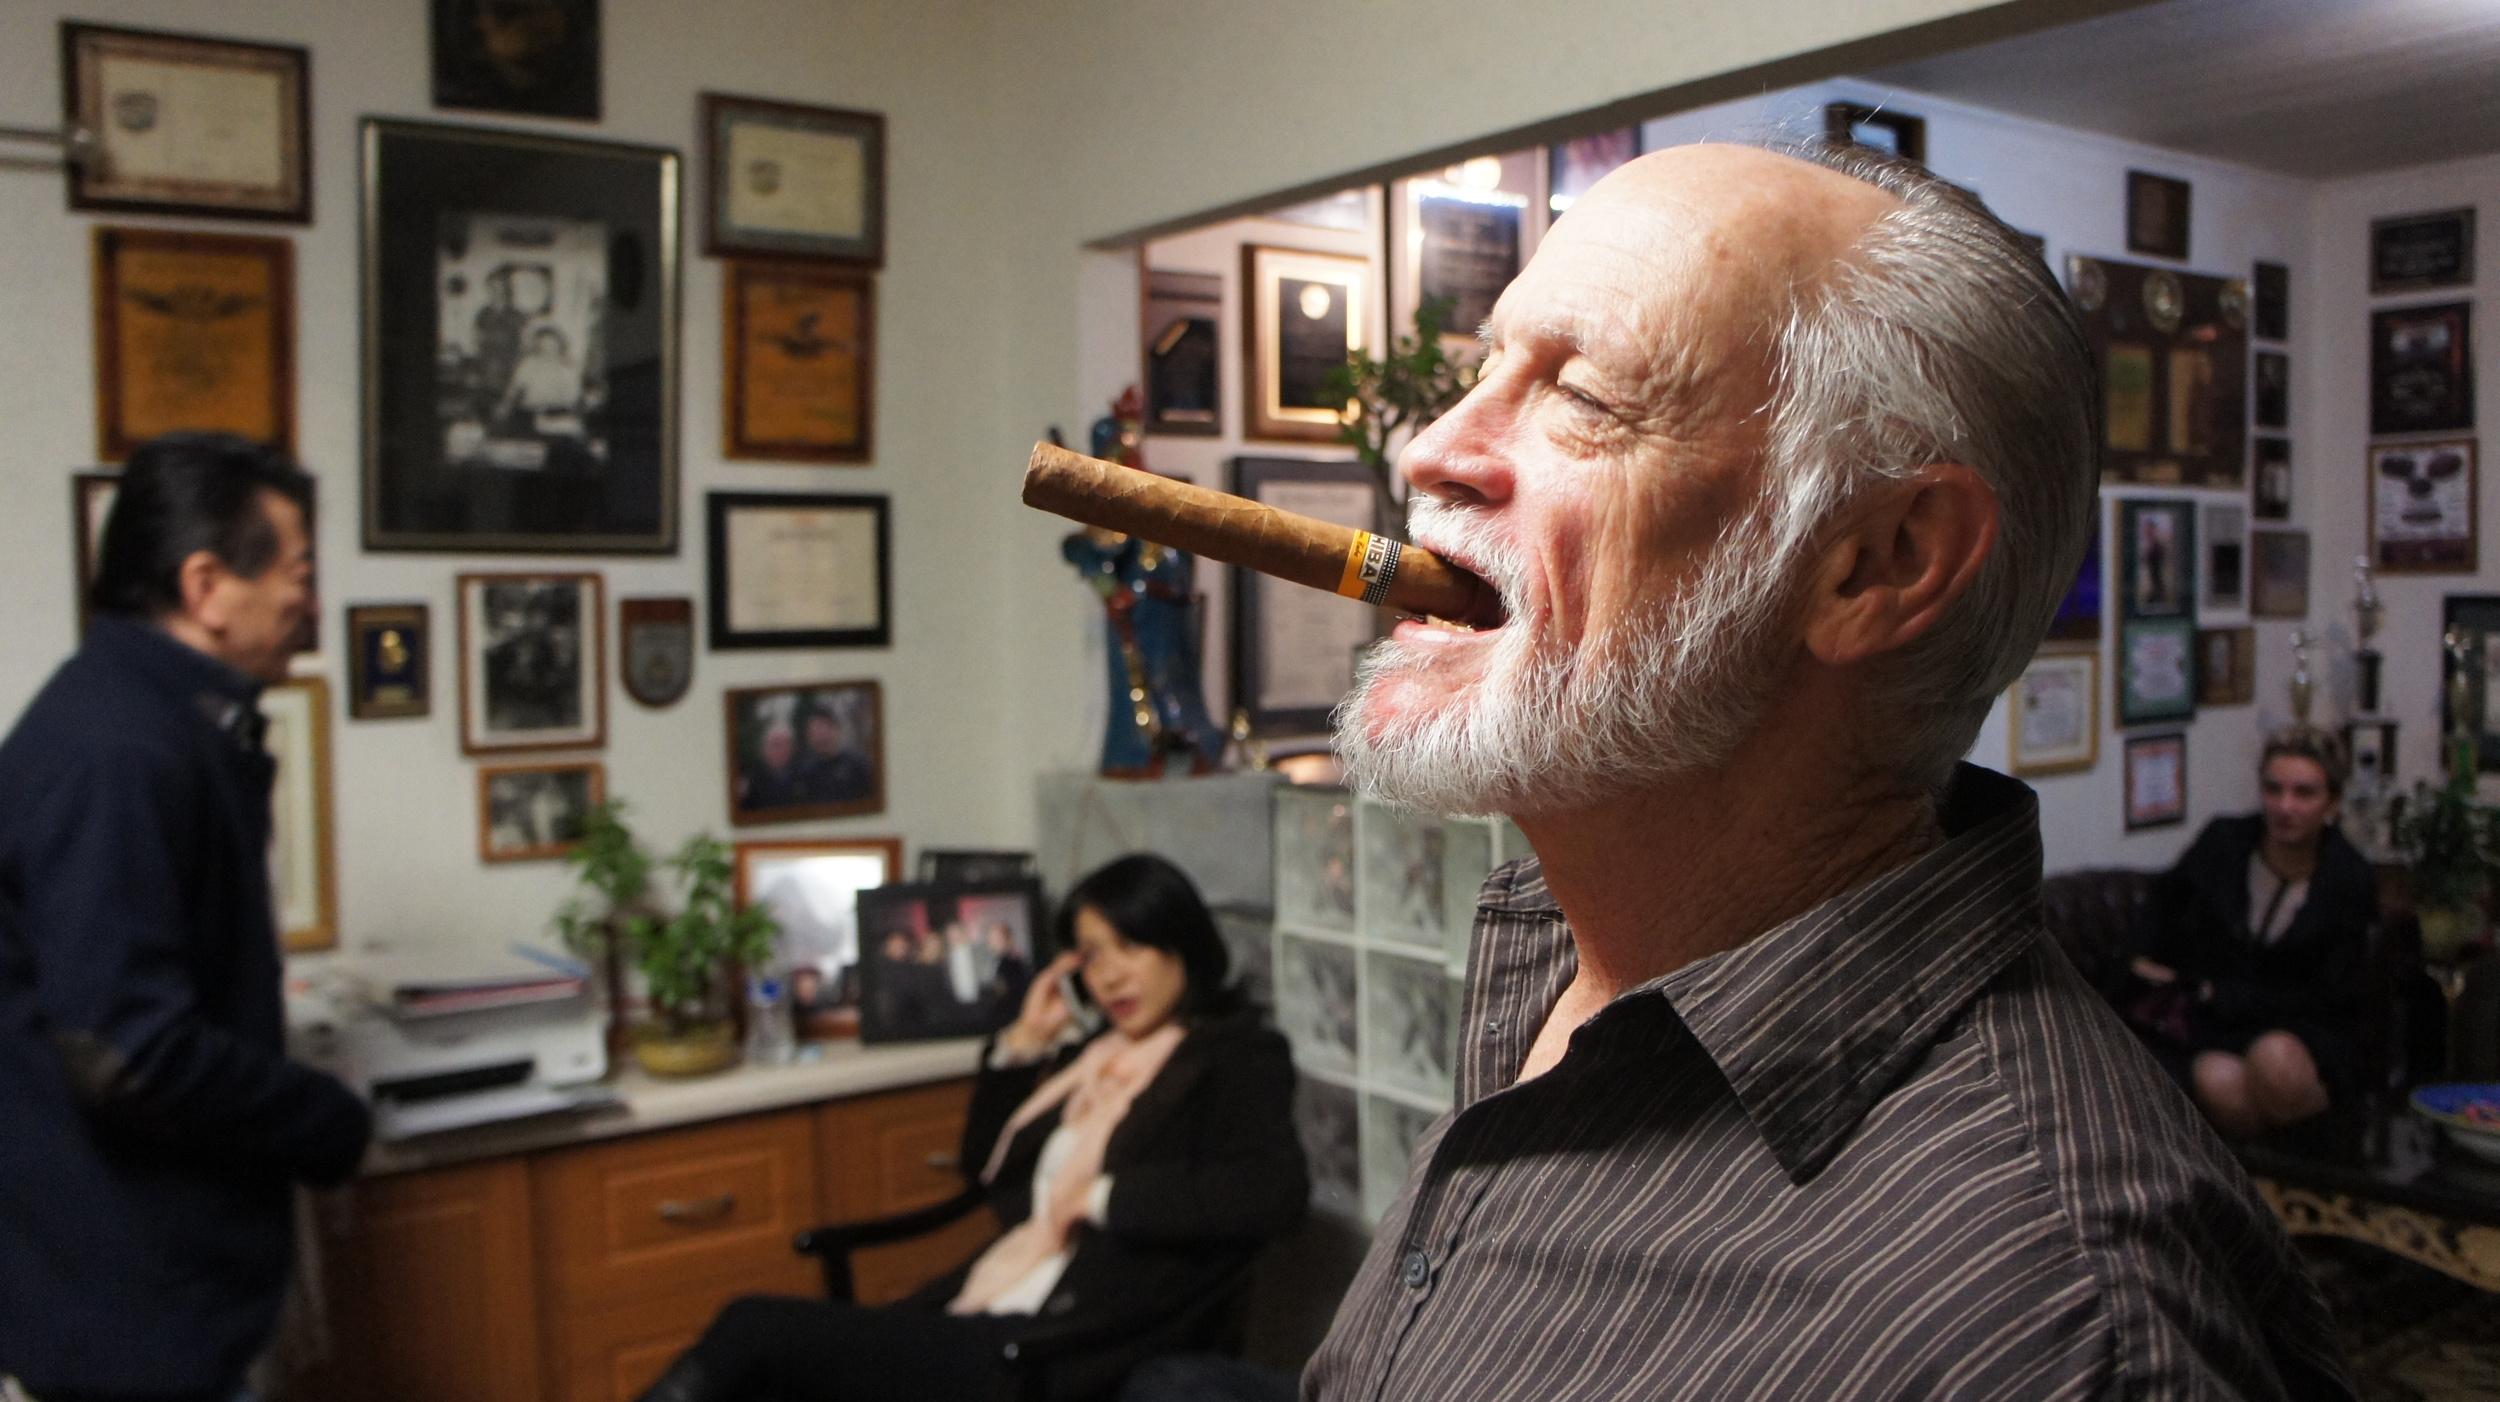 Sihing Rhett and his cigar